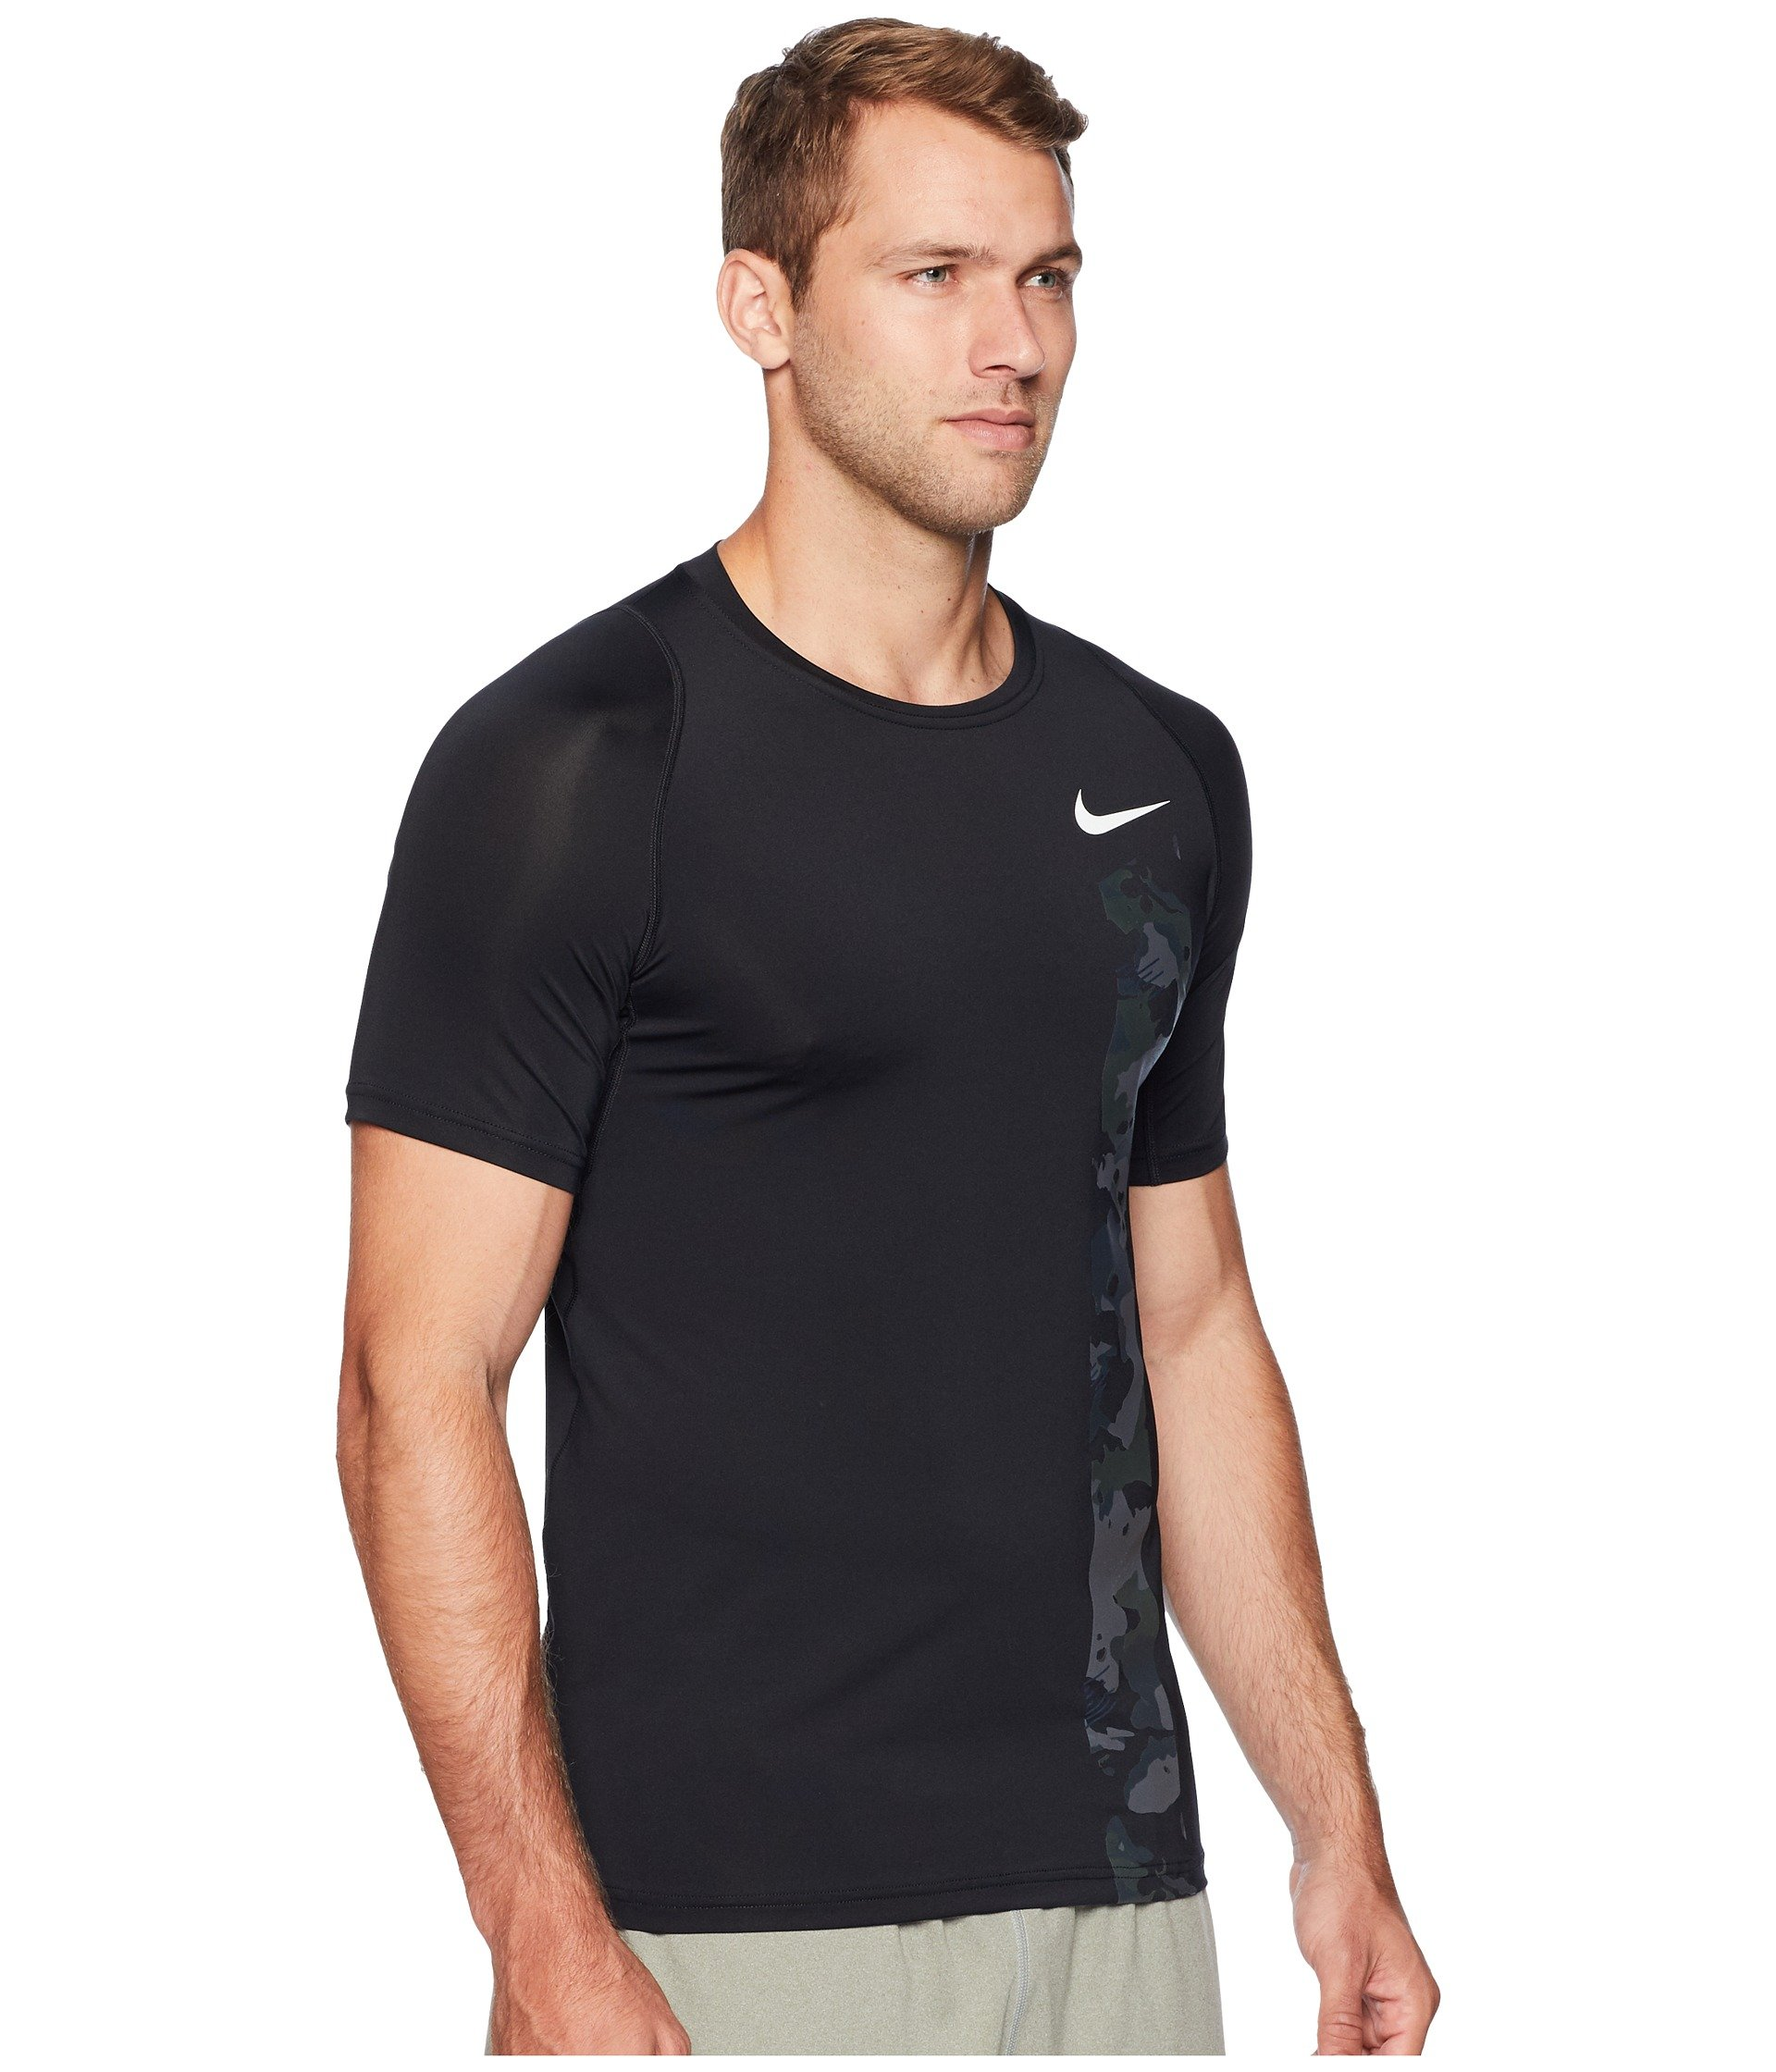 2l Sleeve white Camo Black Pro Nike Top Fitted Short w4xXxftq